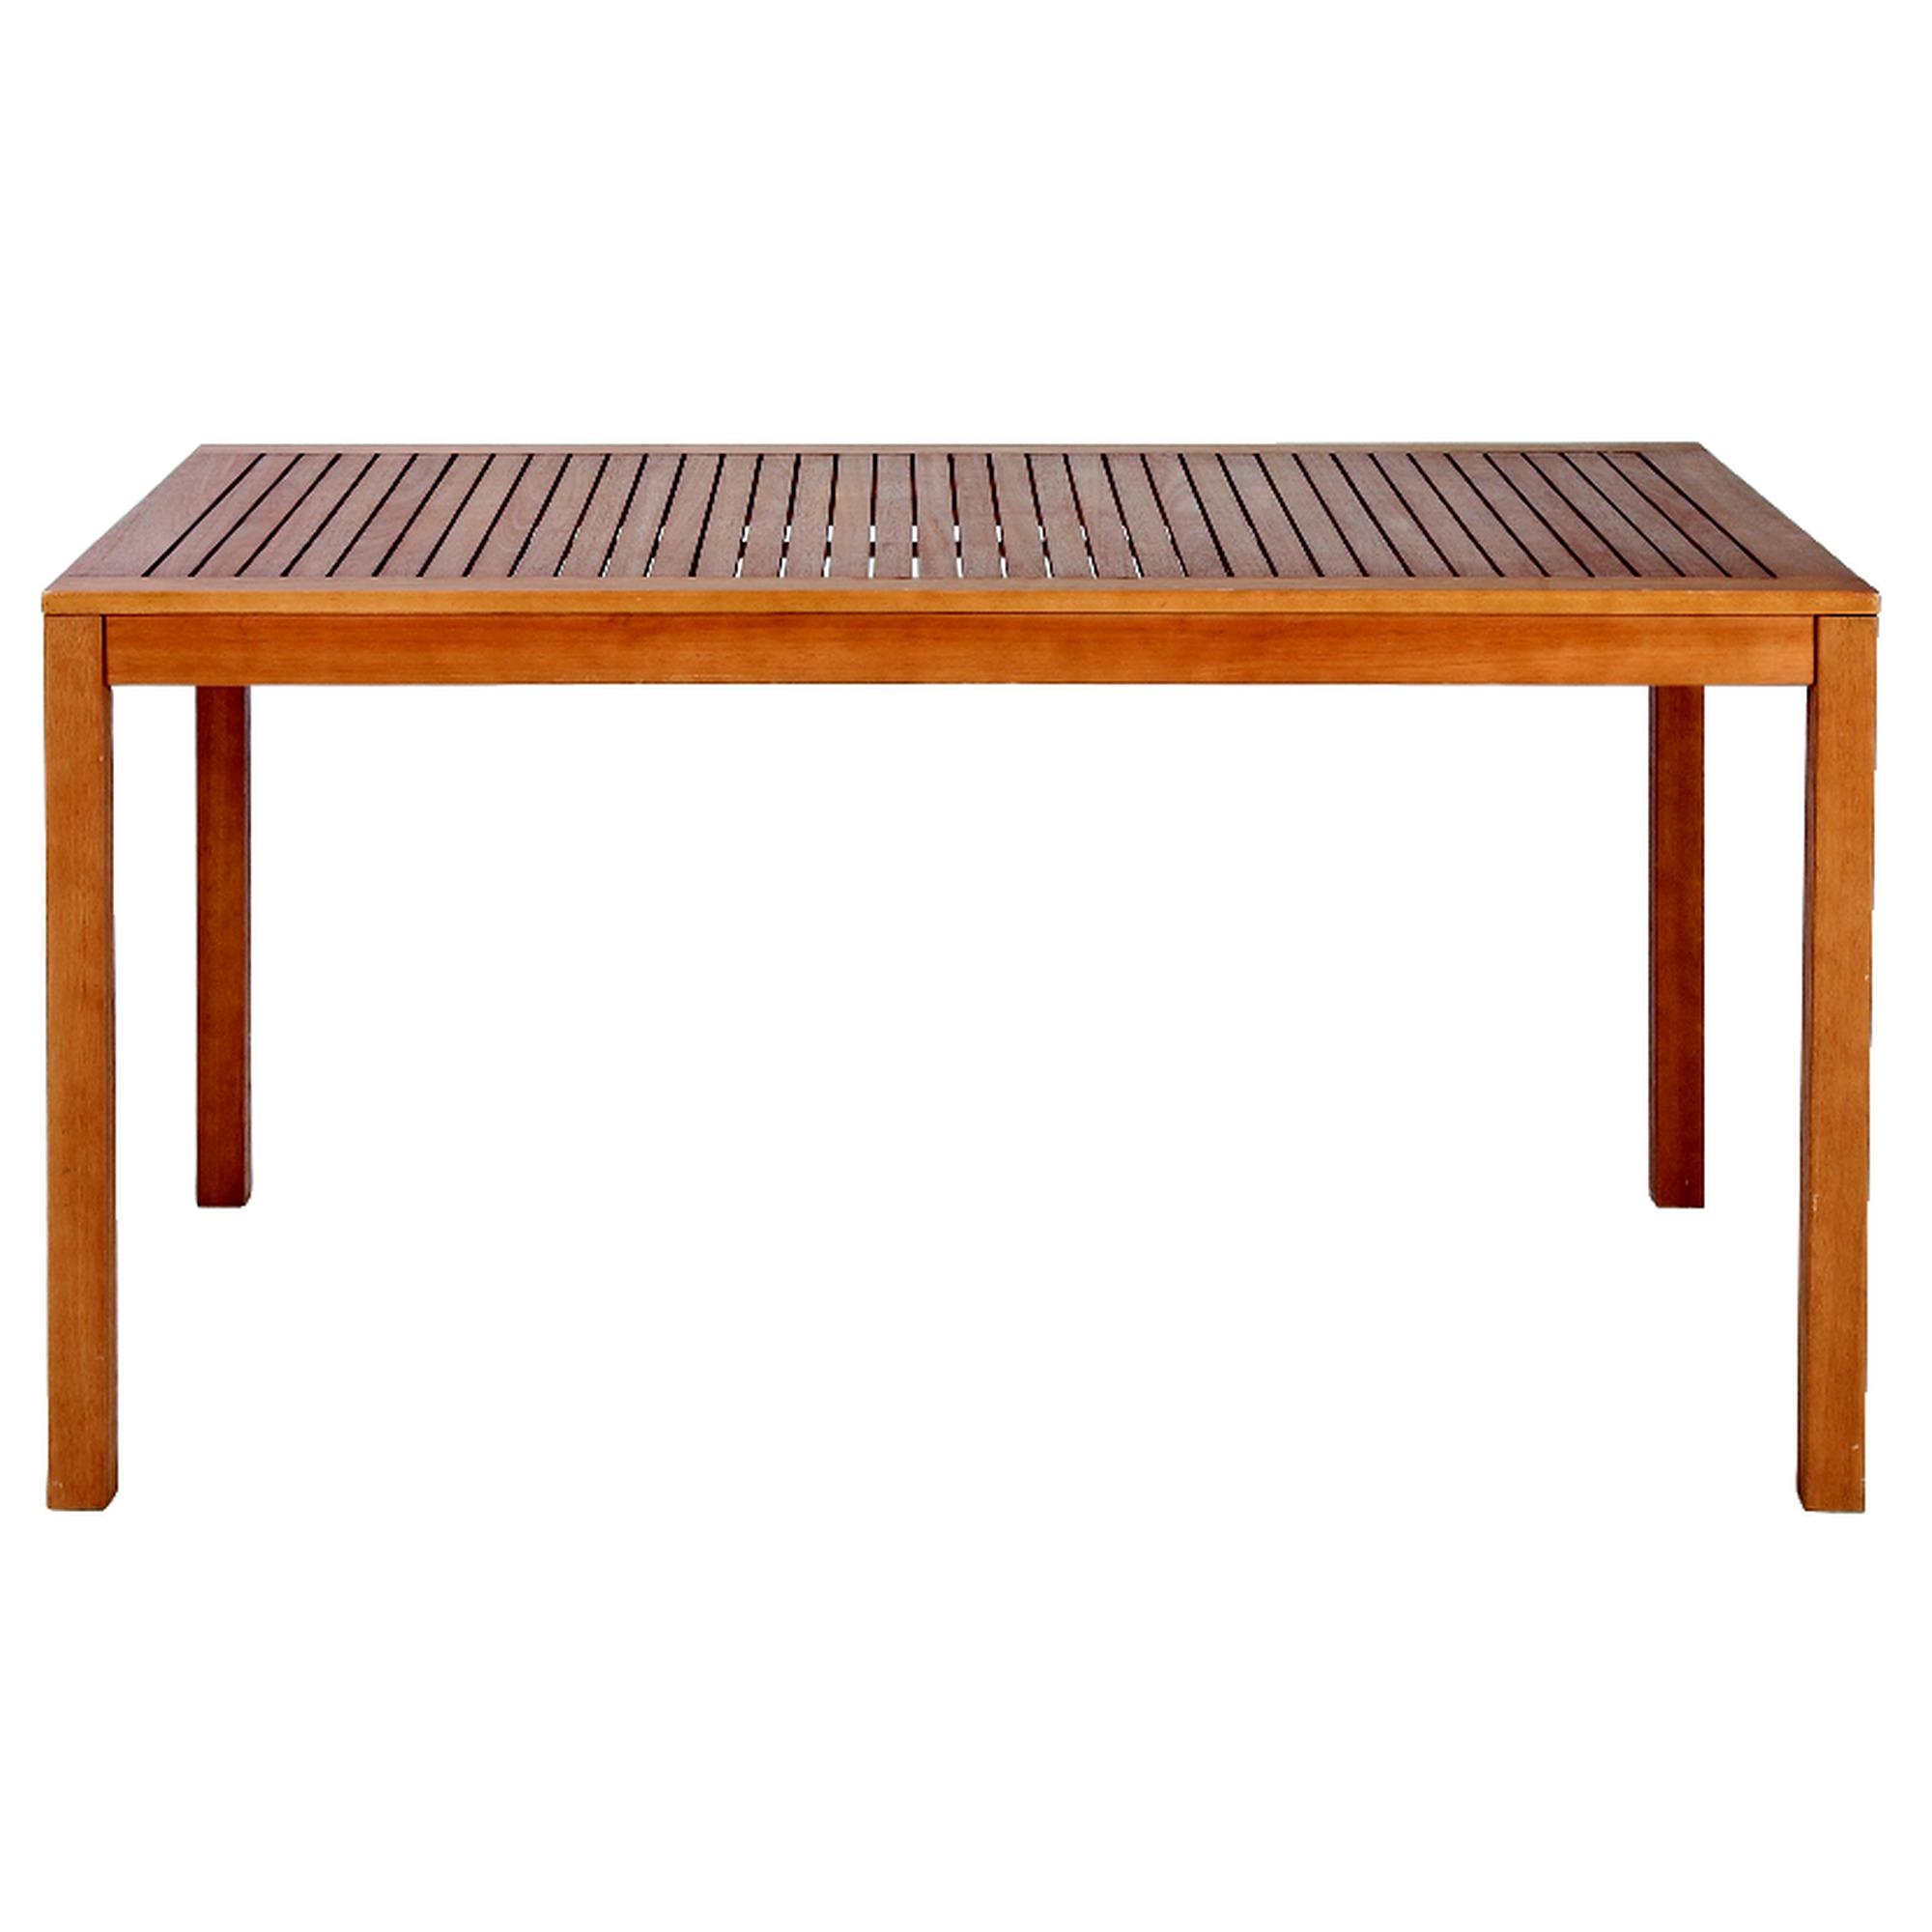 Table Portofino bois  Tables de jardin & salons de jardin ...